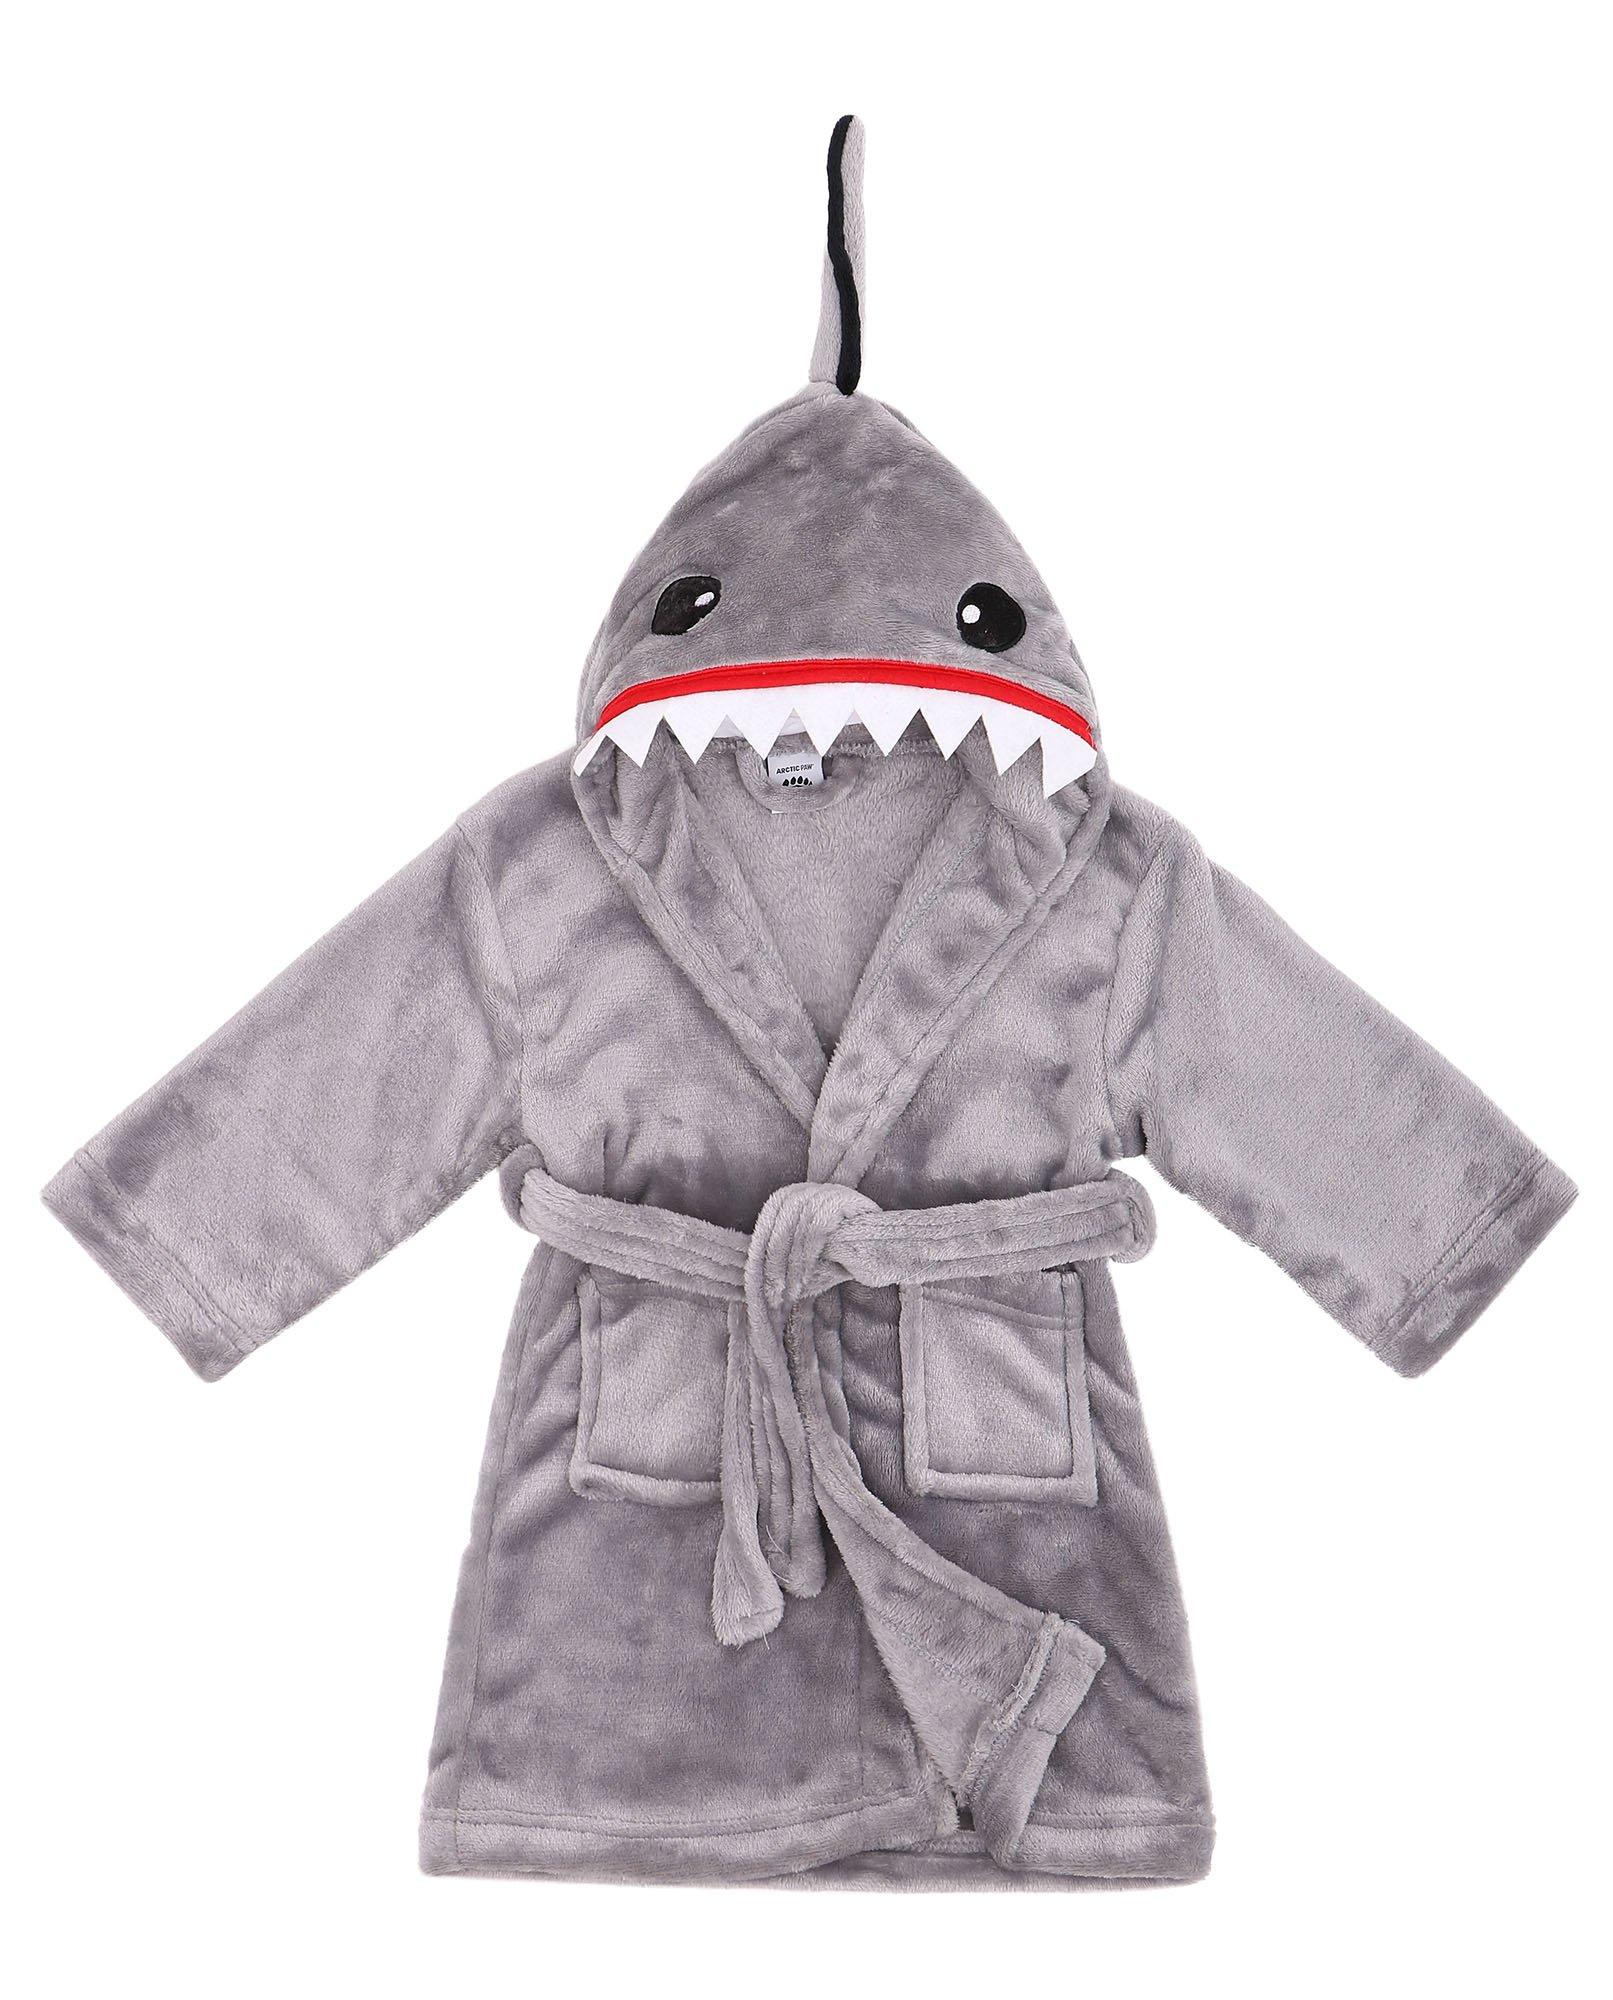 Boys Robe Animal Plush Soft Hooded Fleece Bathrobe,Shark Grey,S(1-3 Years